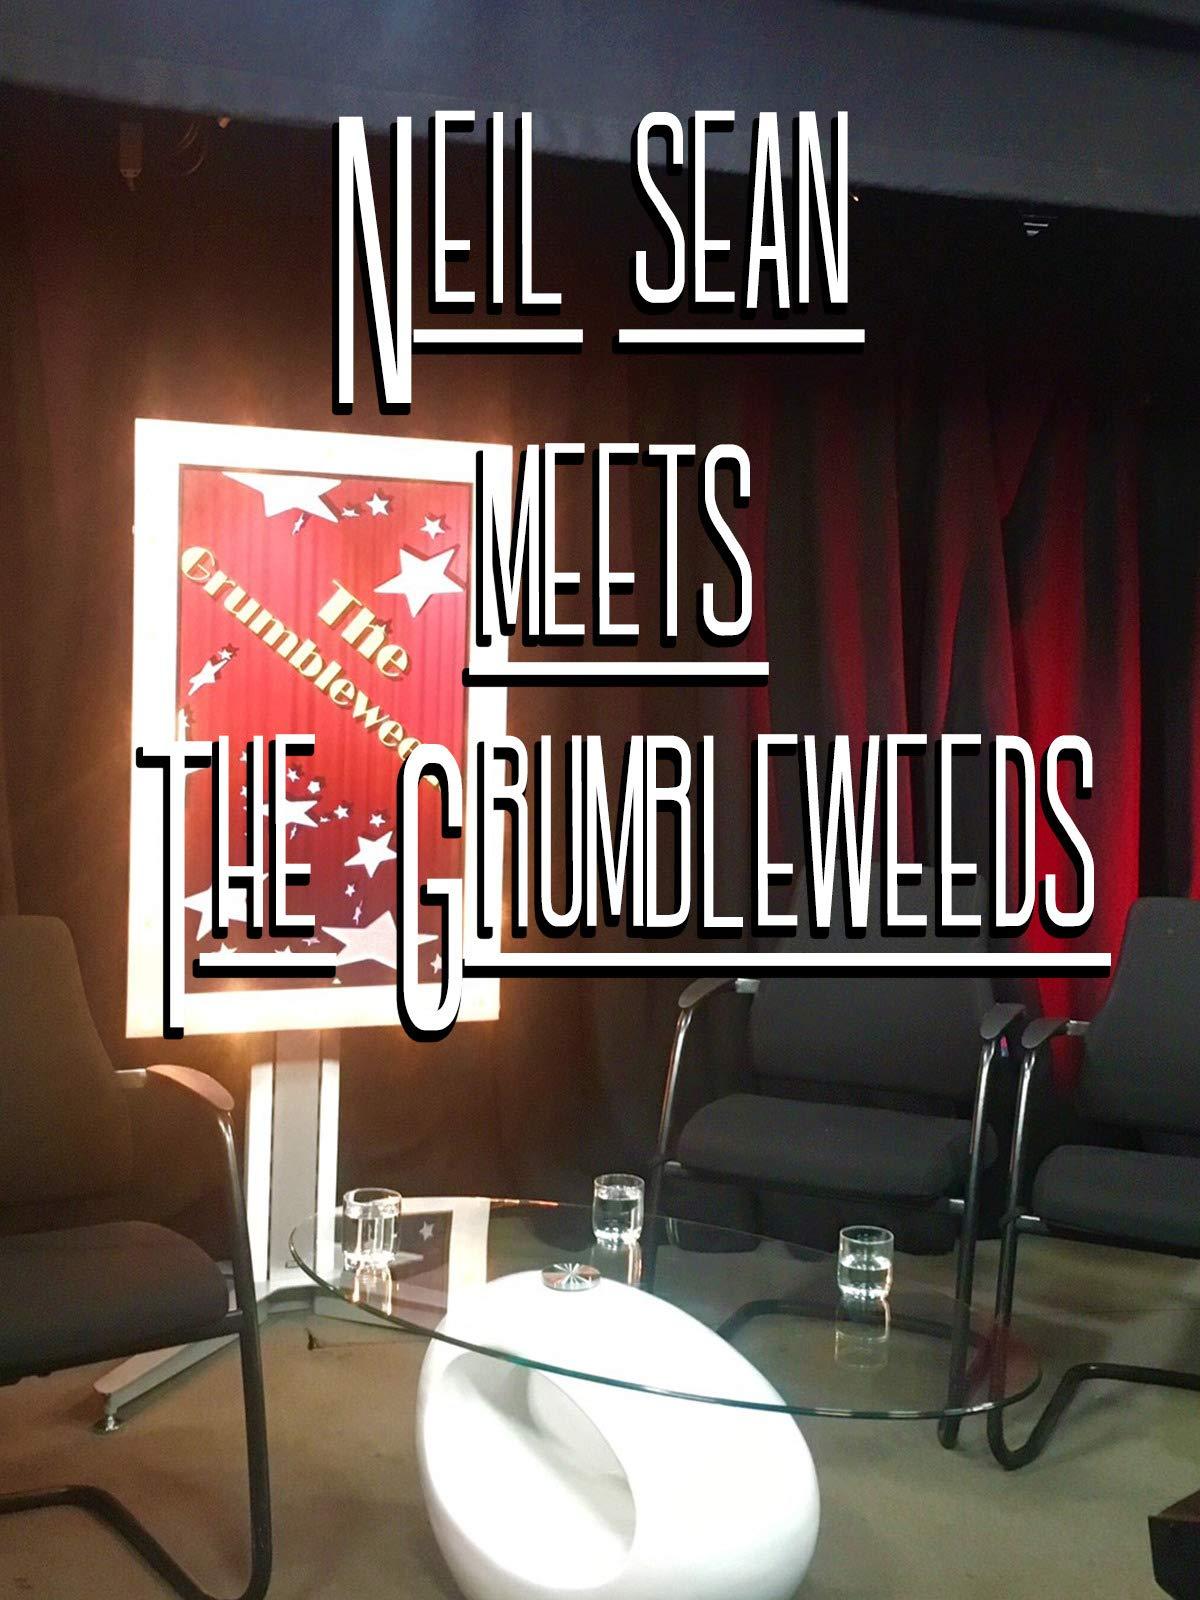 Neil Sean meets The Grumbleweeds on Amazon Prime Video UK